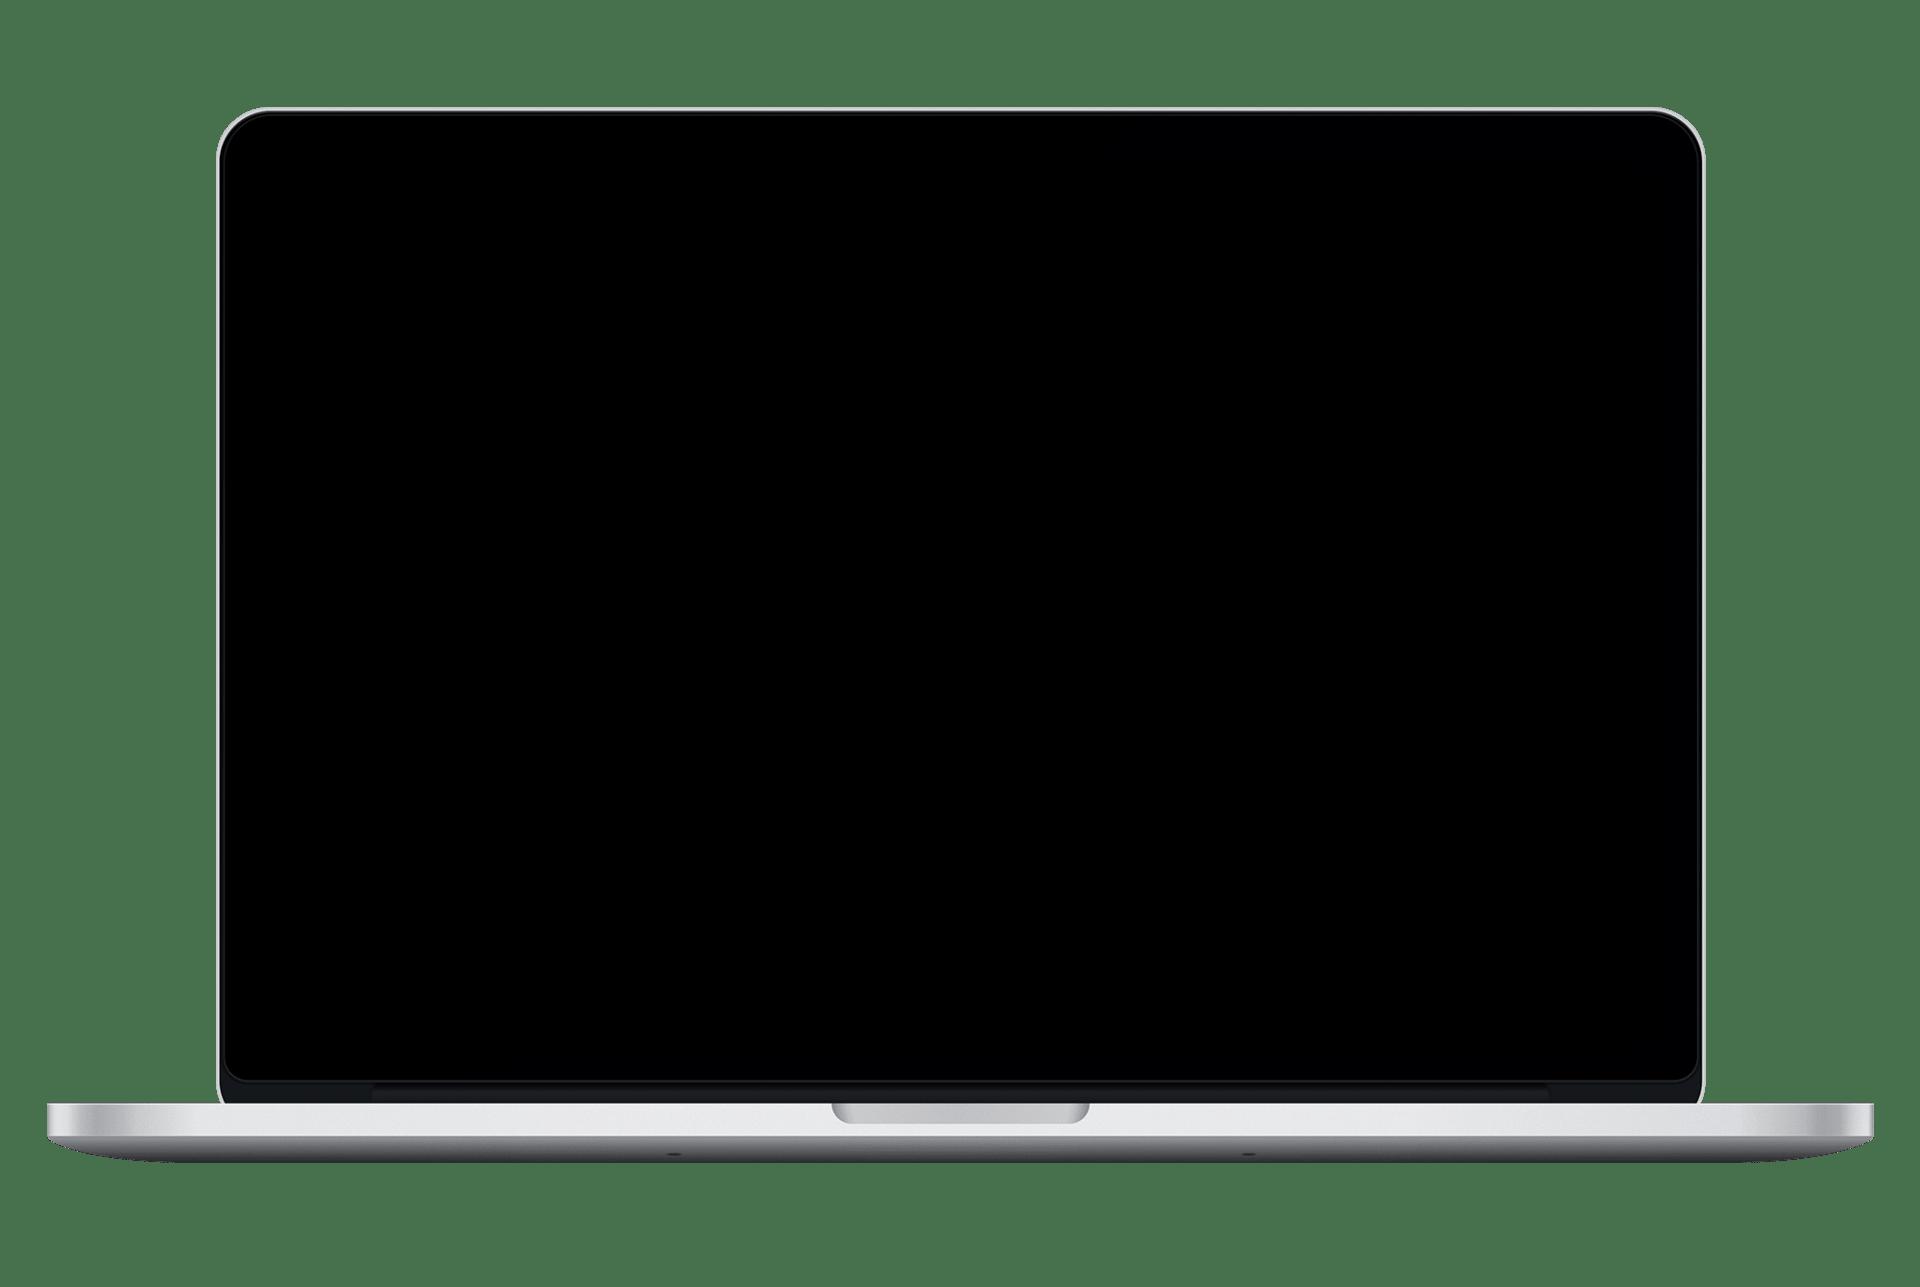 iMac Black Screen 2000x1341 Tiny